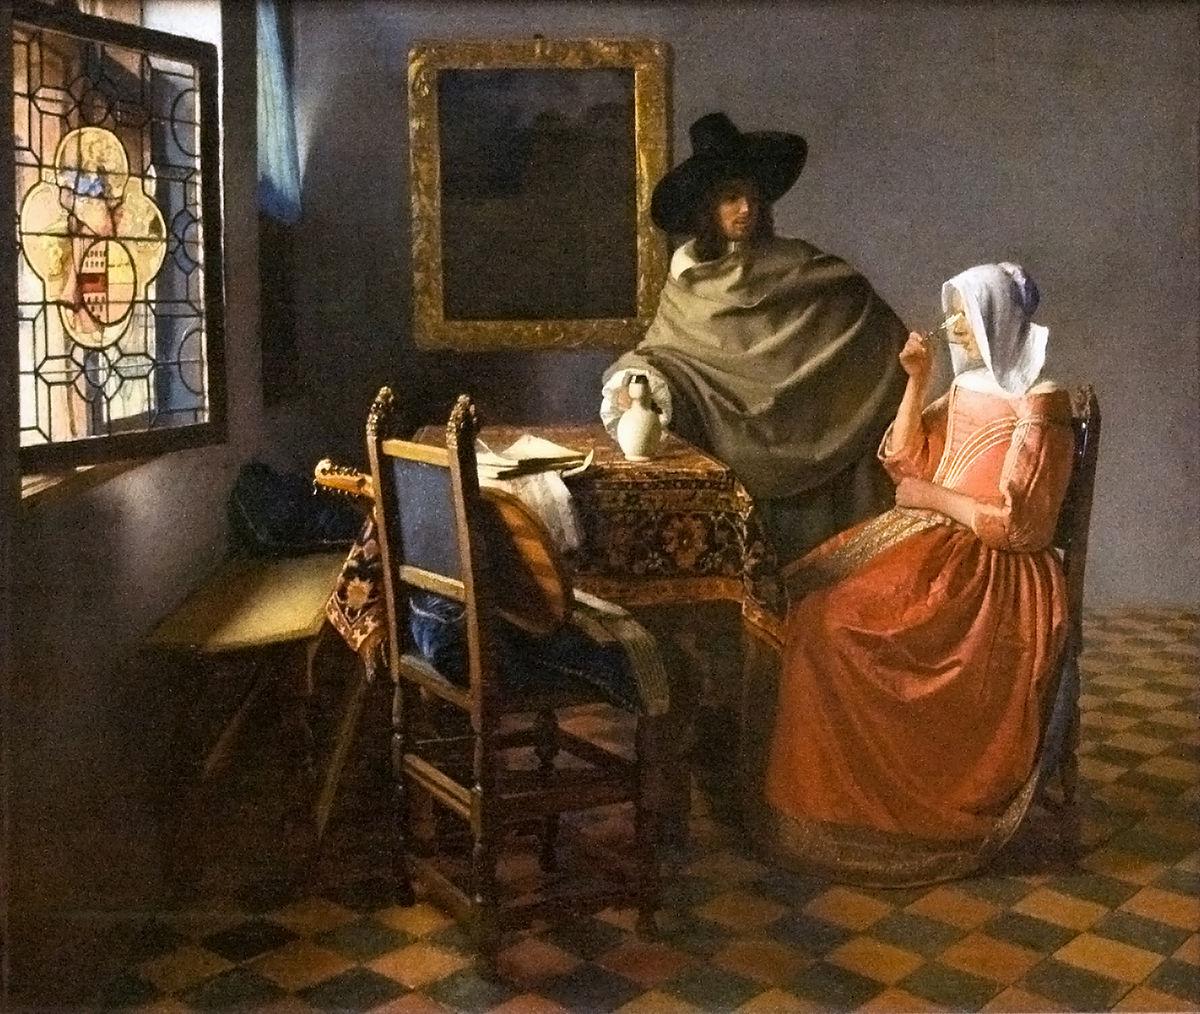 Johannes Vermeer - The Wine Glass (c 1658-1660).jpg